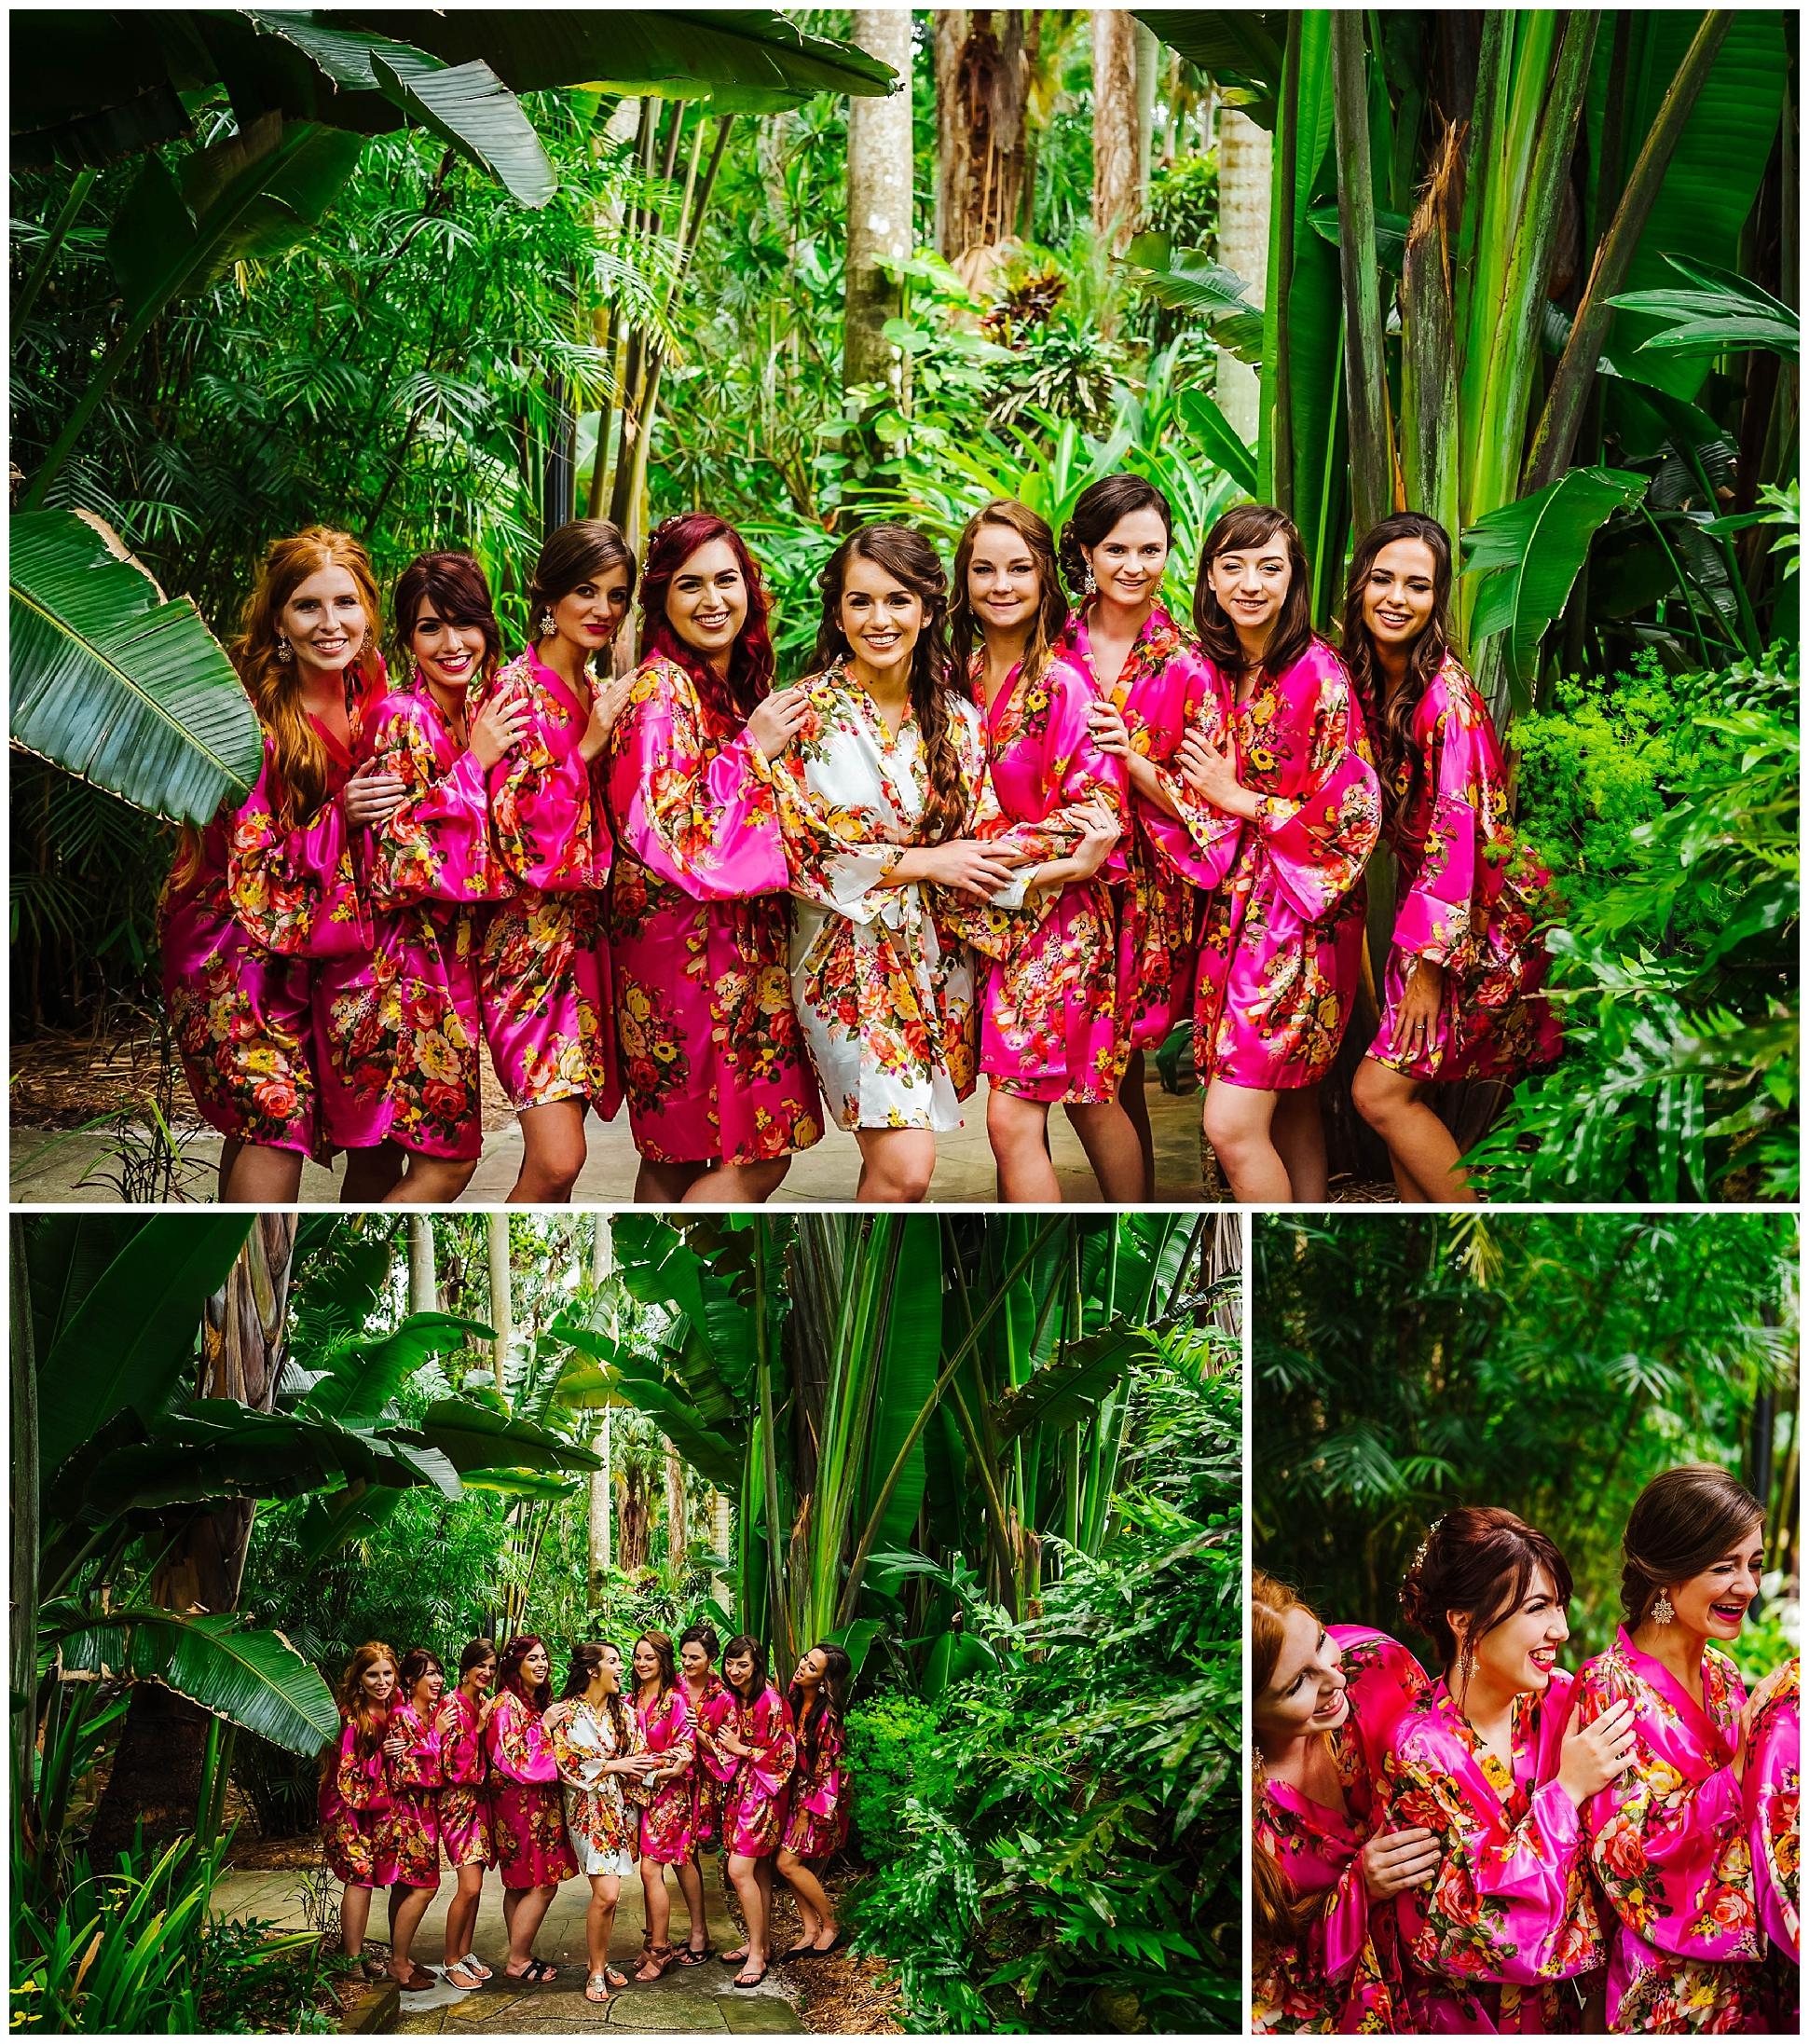 st-pete-wedding-photographer-sunken-gardens-crystal-ballroom-princess-dancer_0124.jpg